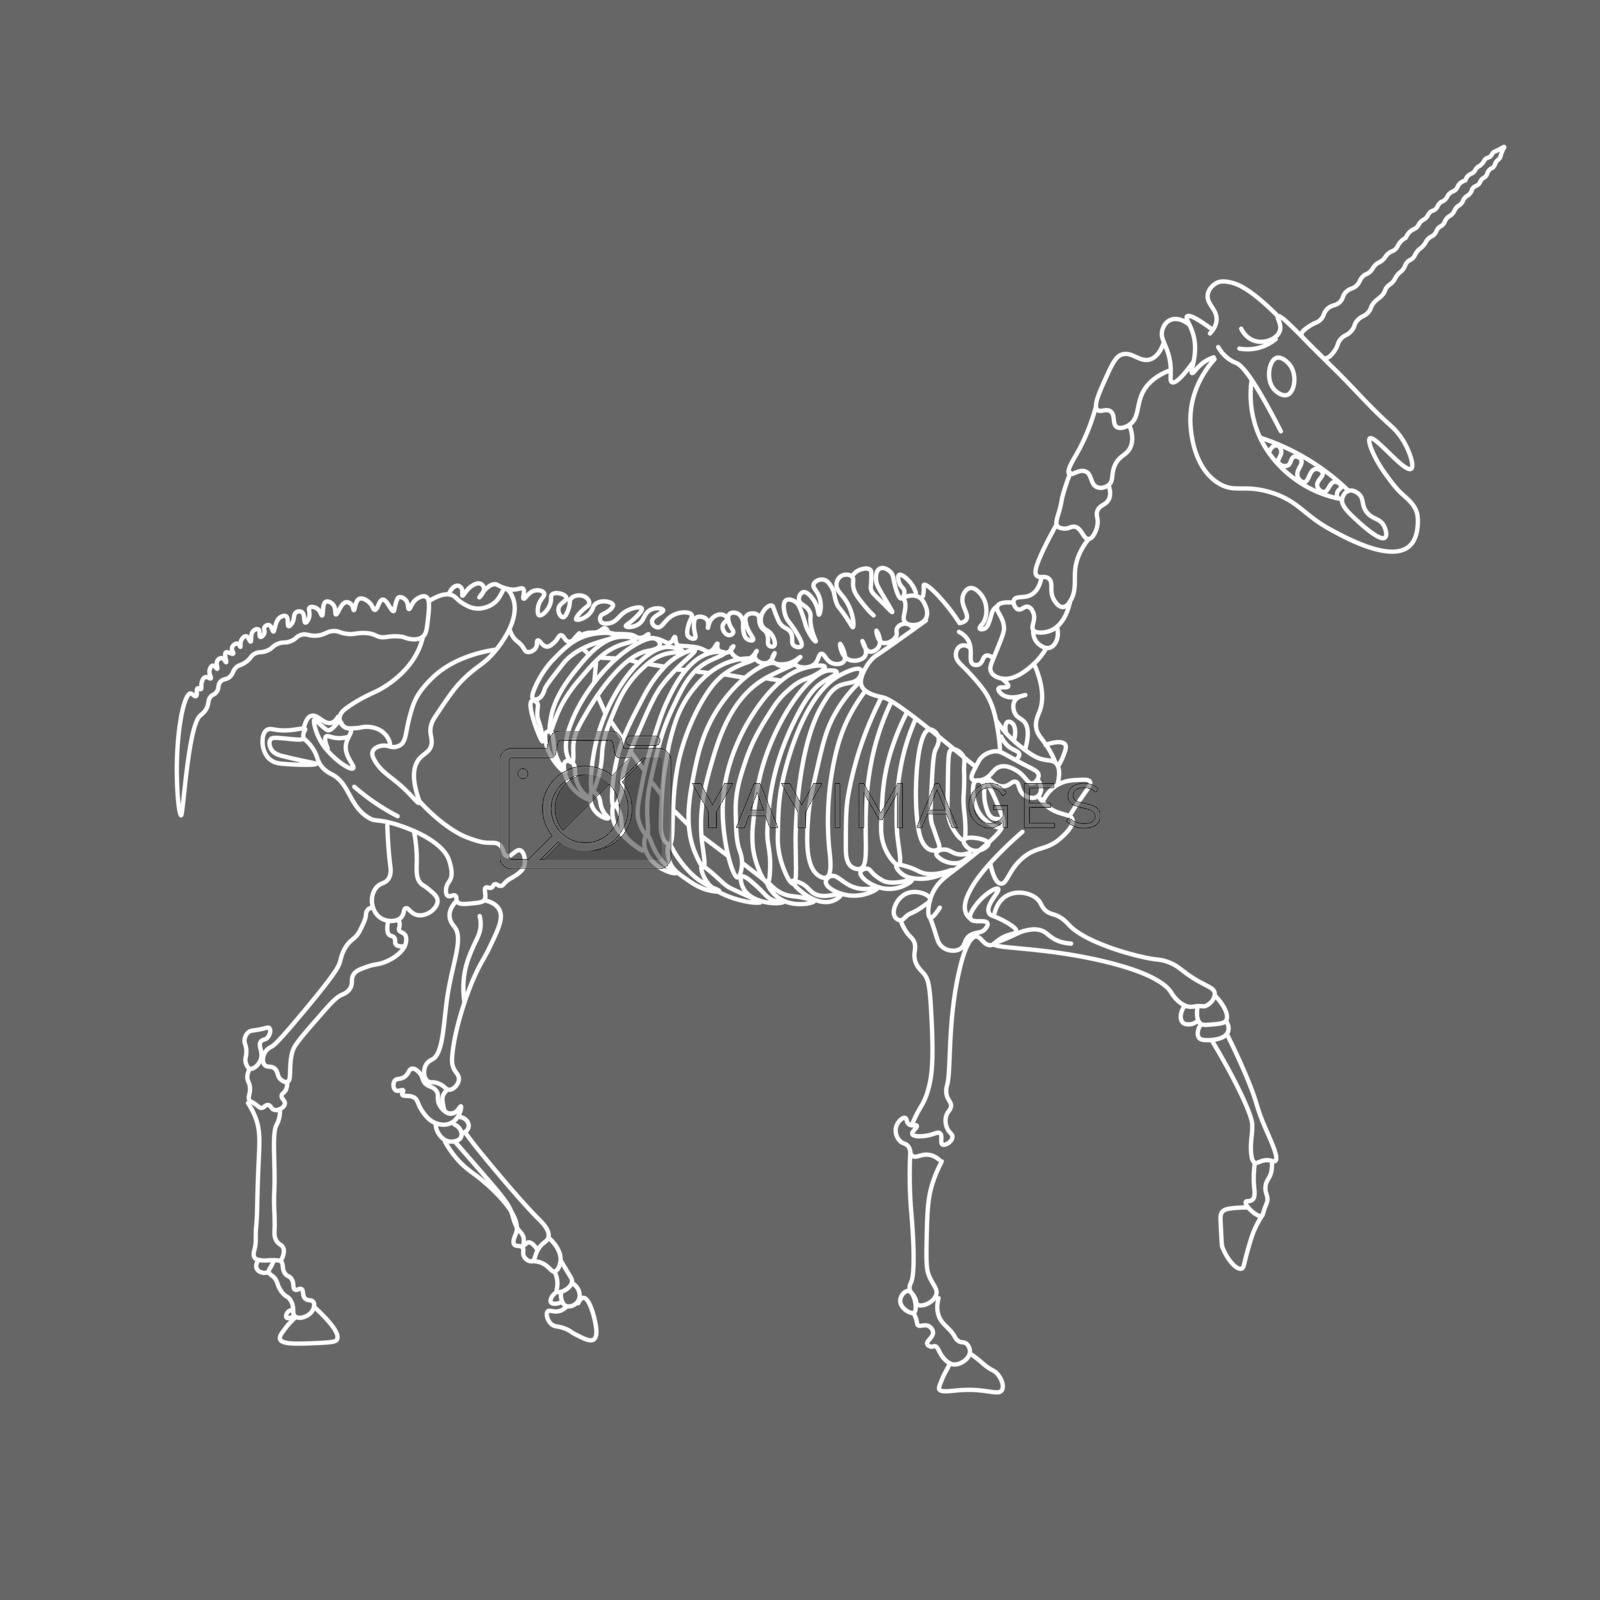 Line art of white running unicorn skeleton on grey background